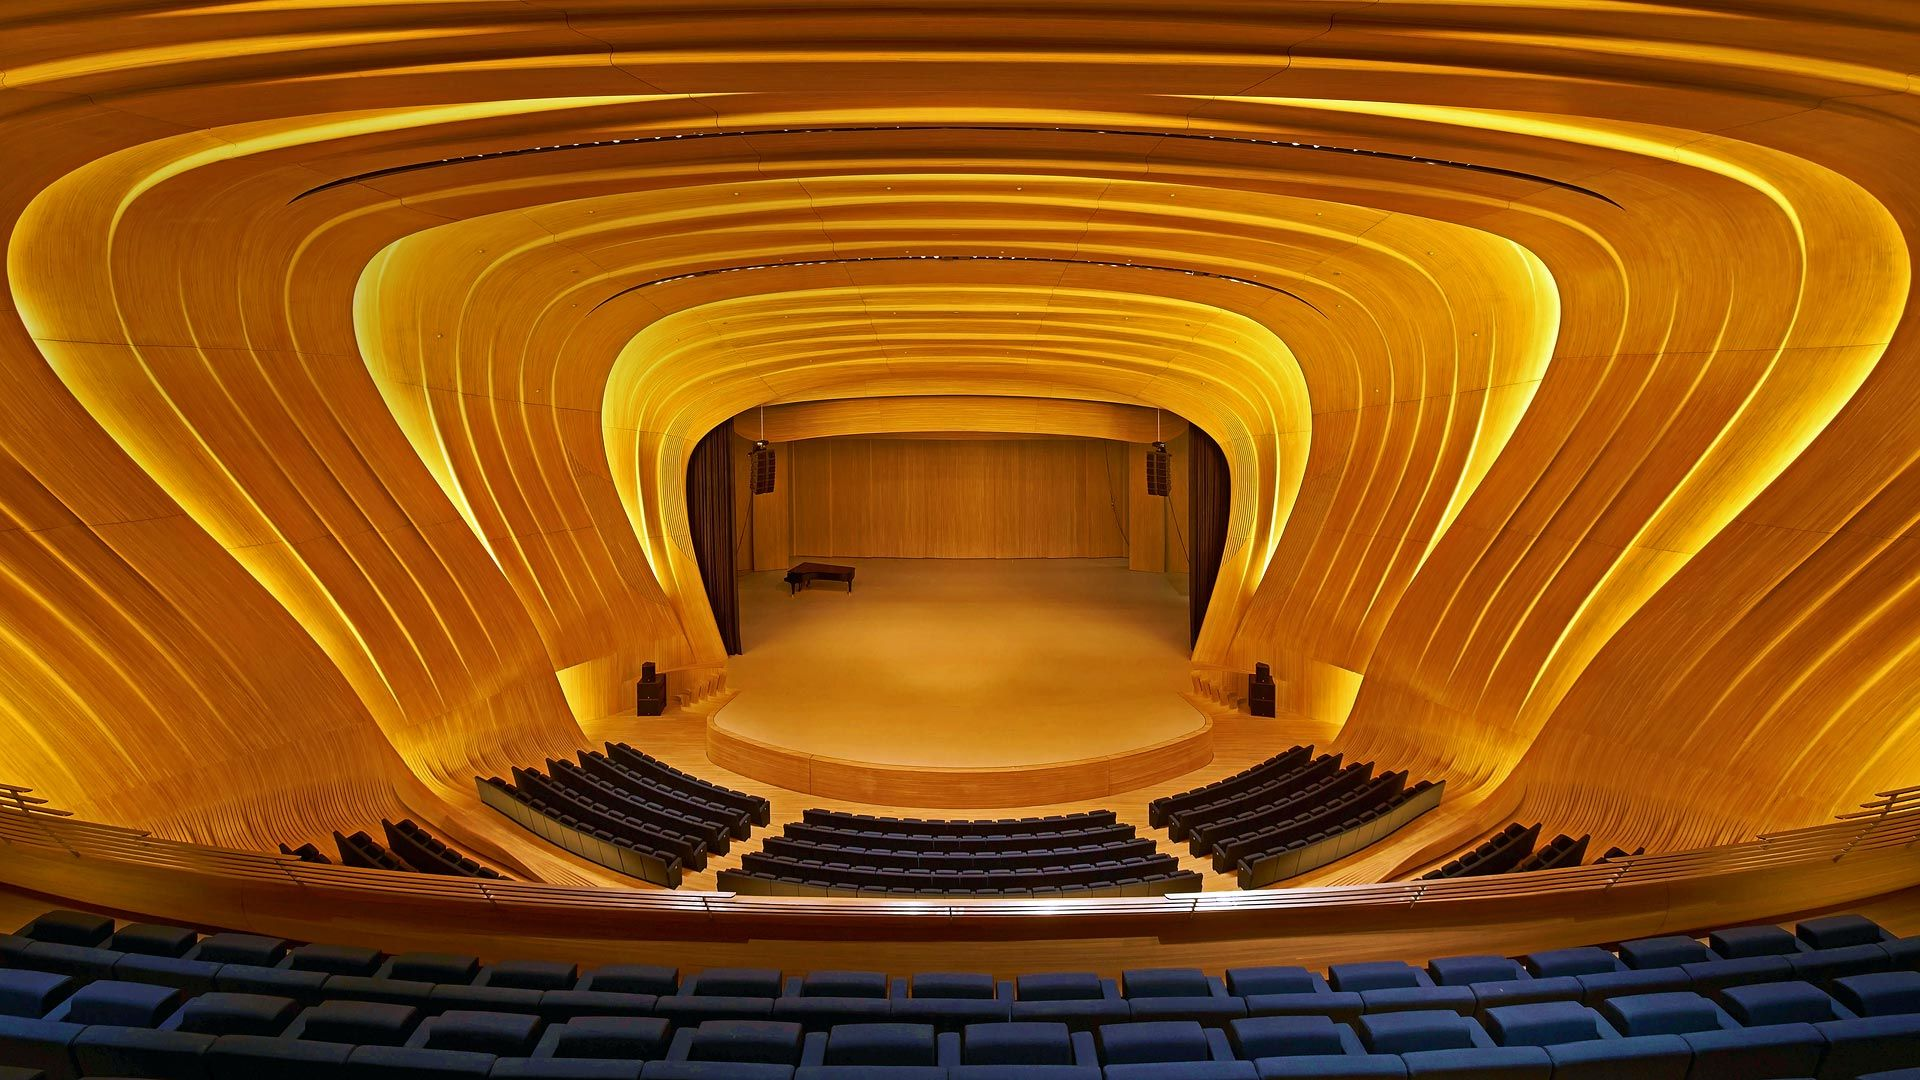 Concert Hall Of The Heydar Aliyev Center In Baku Azerbaijan C View Pictures Ltd Alamy 2015 12 03 Http Concert Hall Architecture Architecture Wallpaper